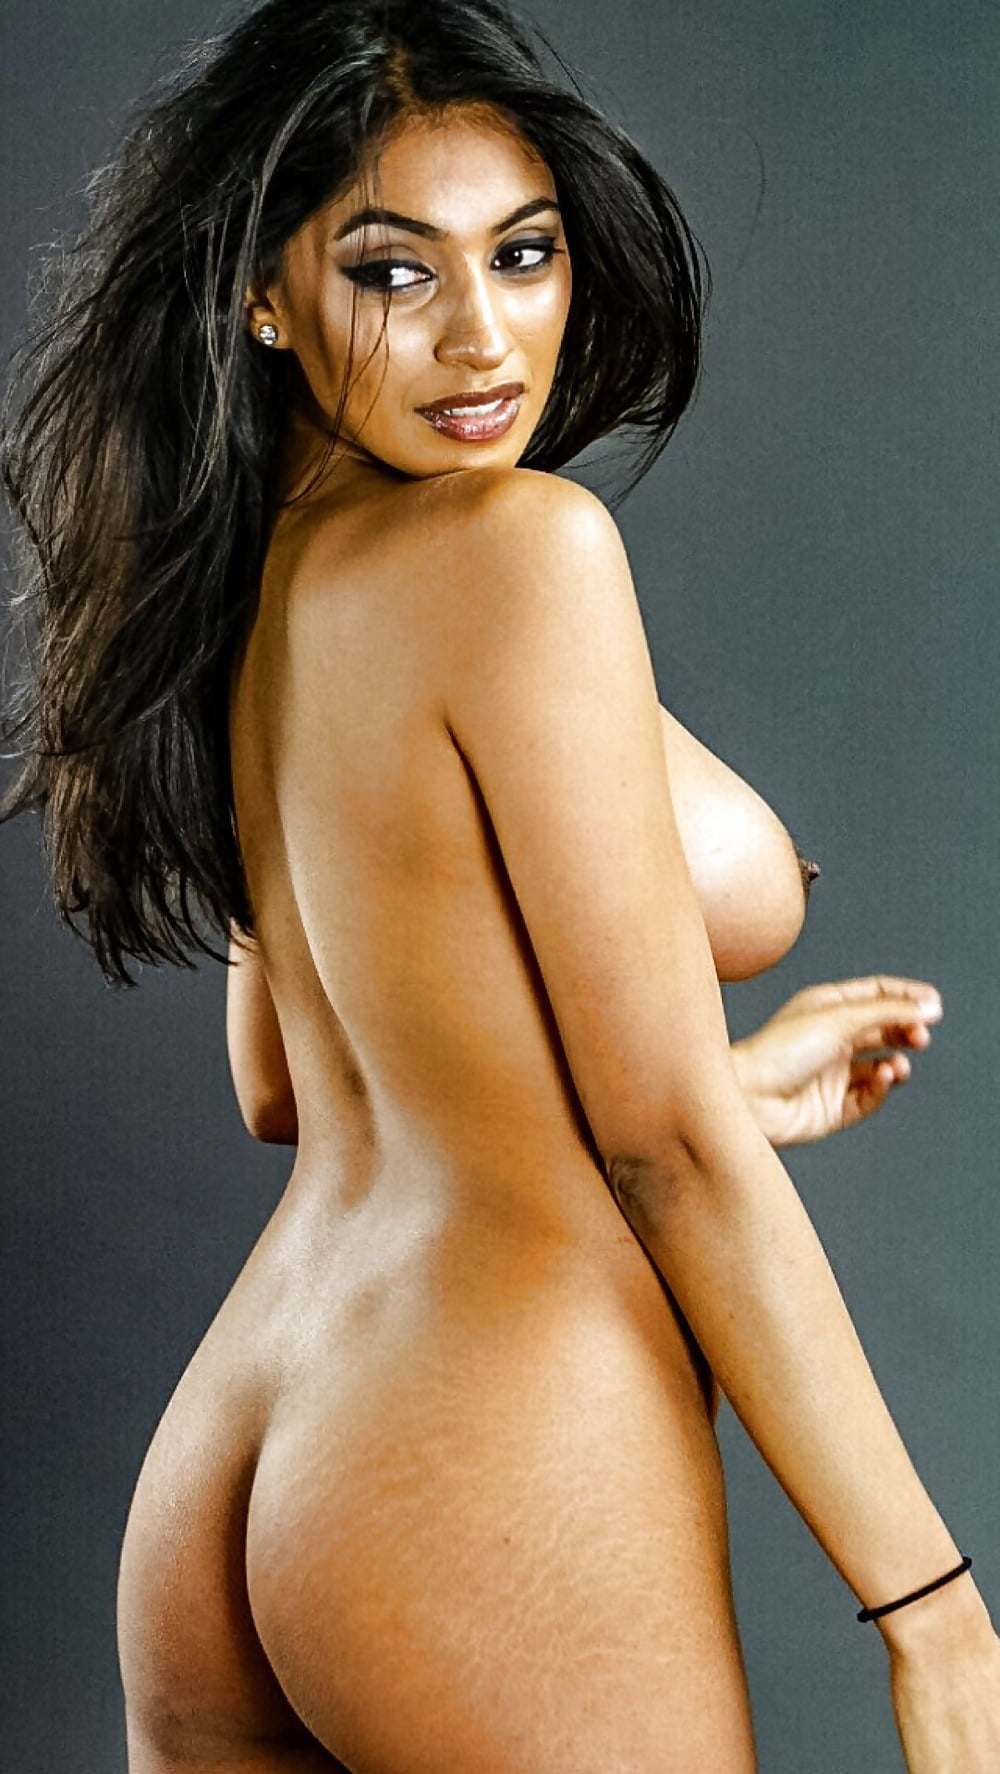 South Indian Heroine Amrutha Valli Hot Nude Pics